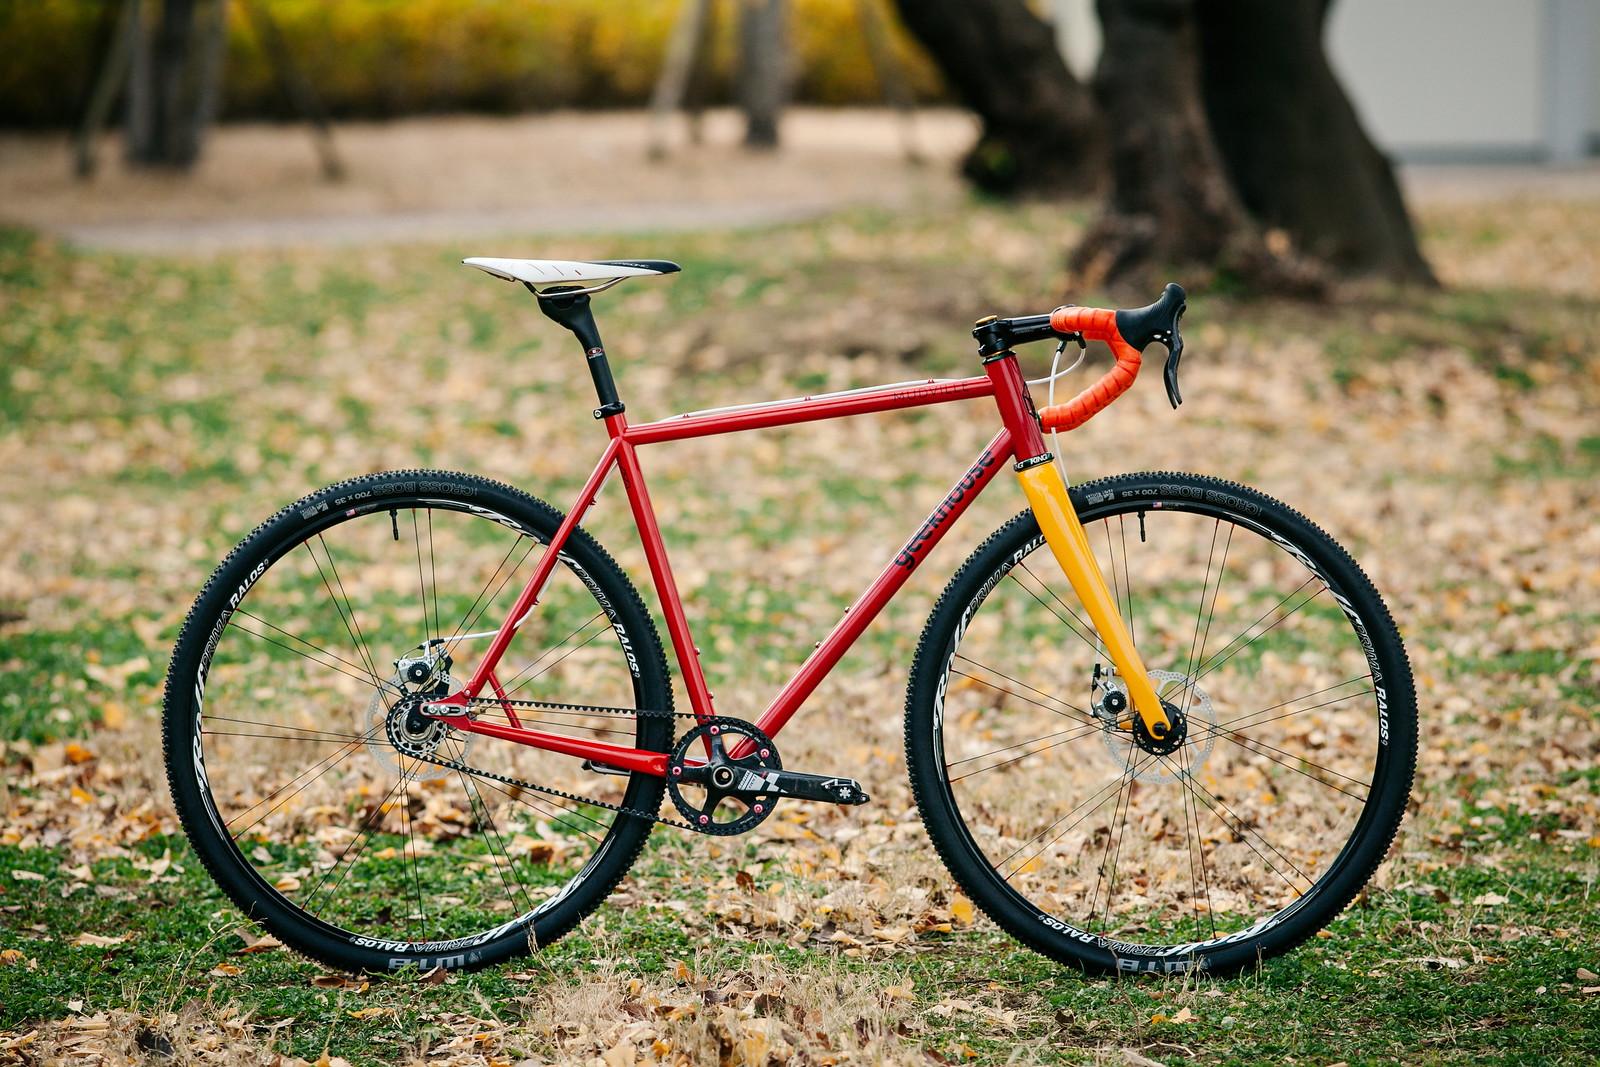 *GEEKHOUSE BIKES* Mudville SSCX Belt Drive complete bike